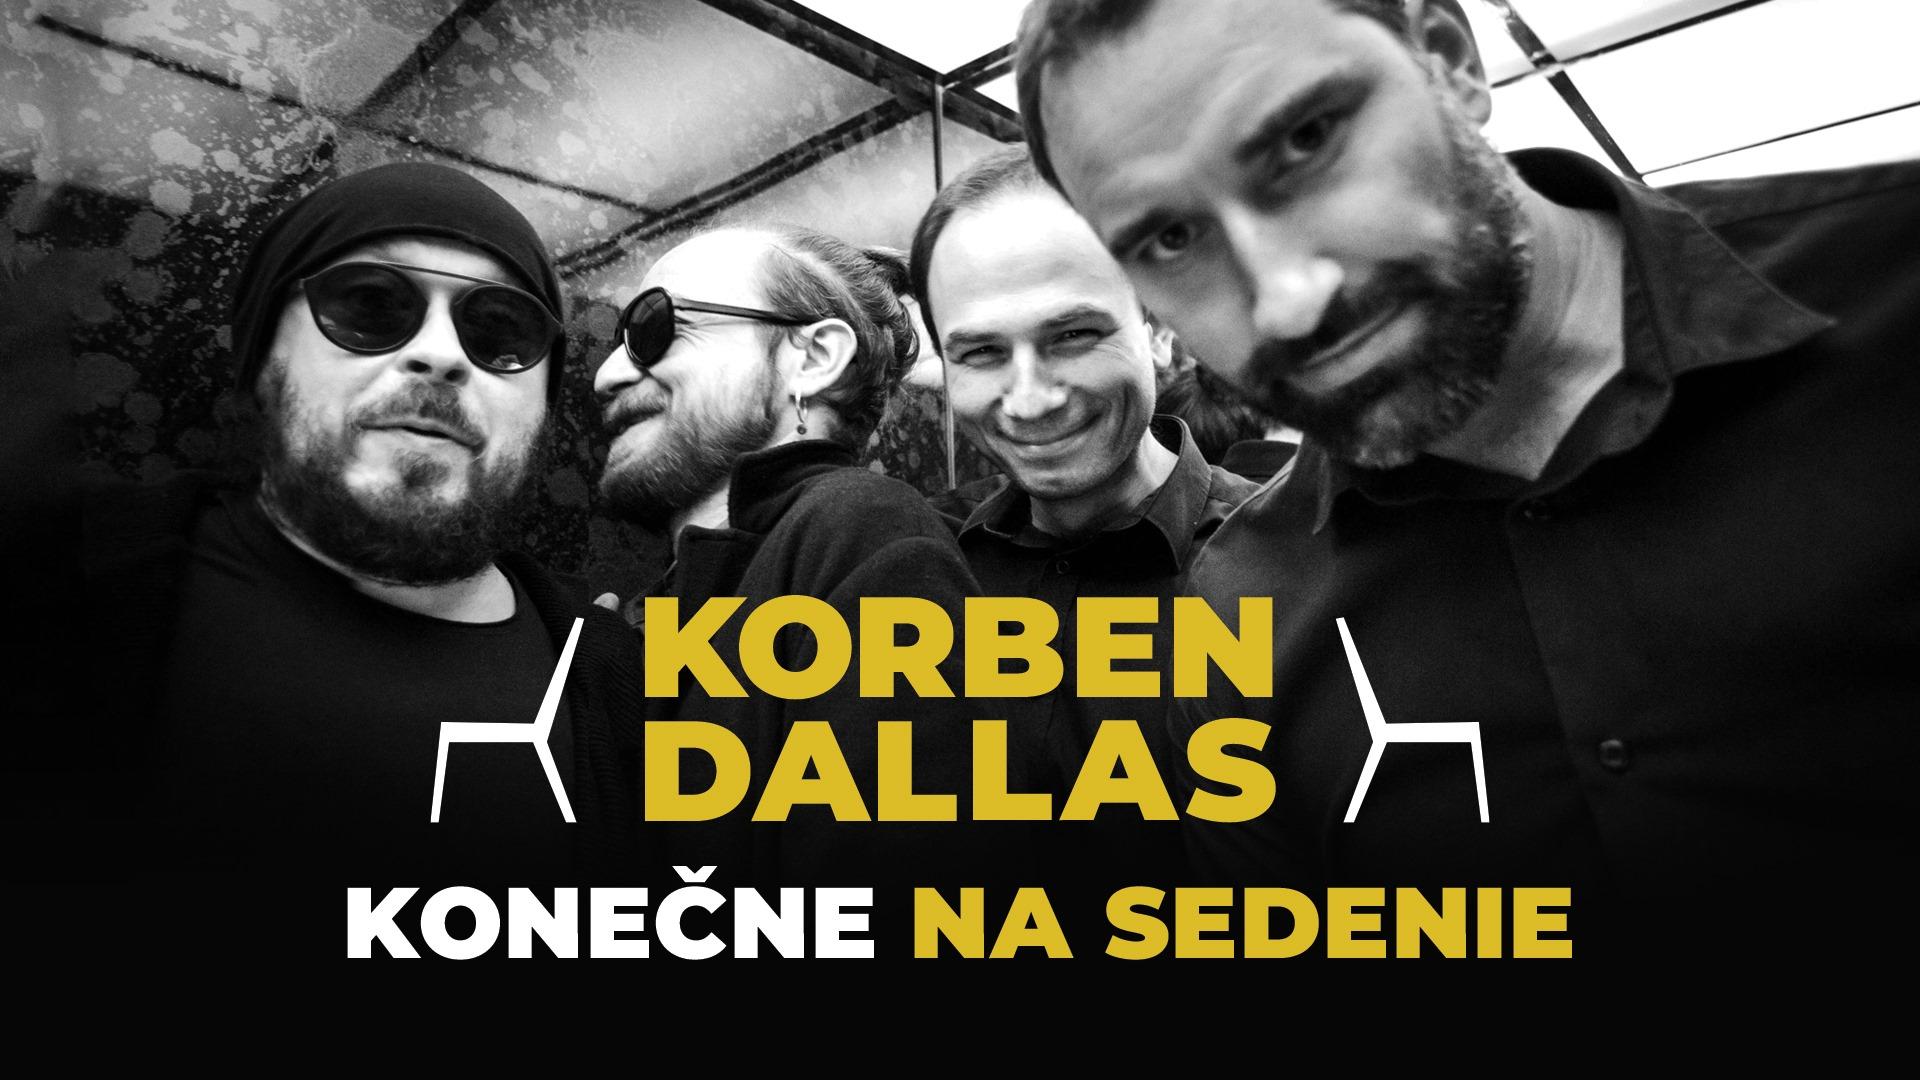 Korben Dallas - Konečne na sedenie l Banská Bystrica